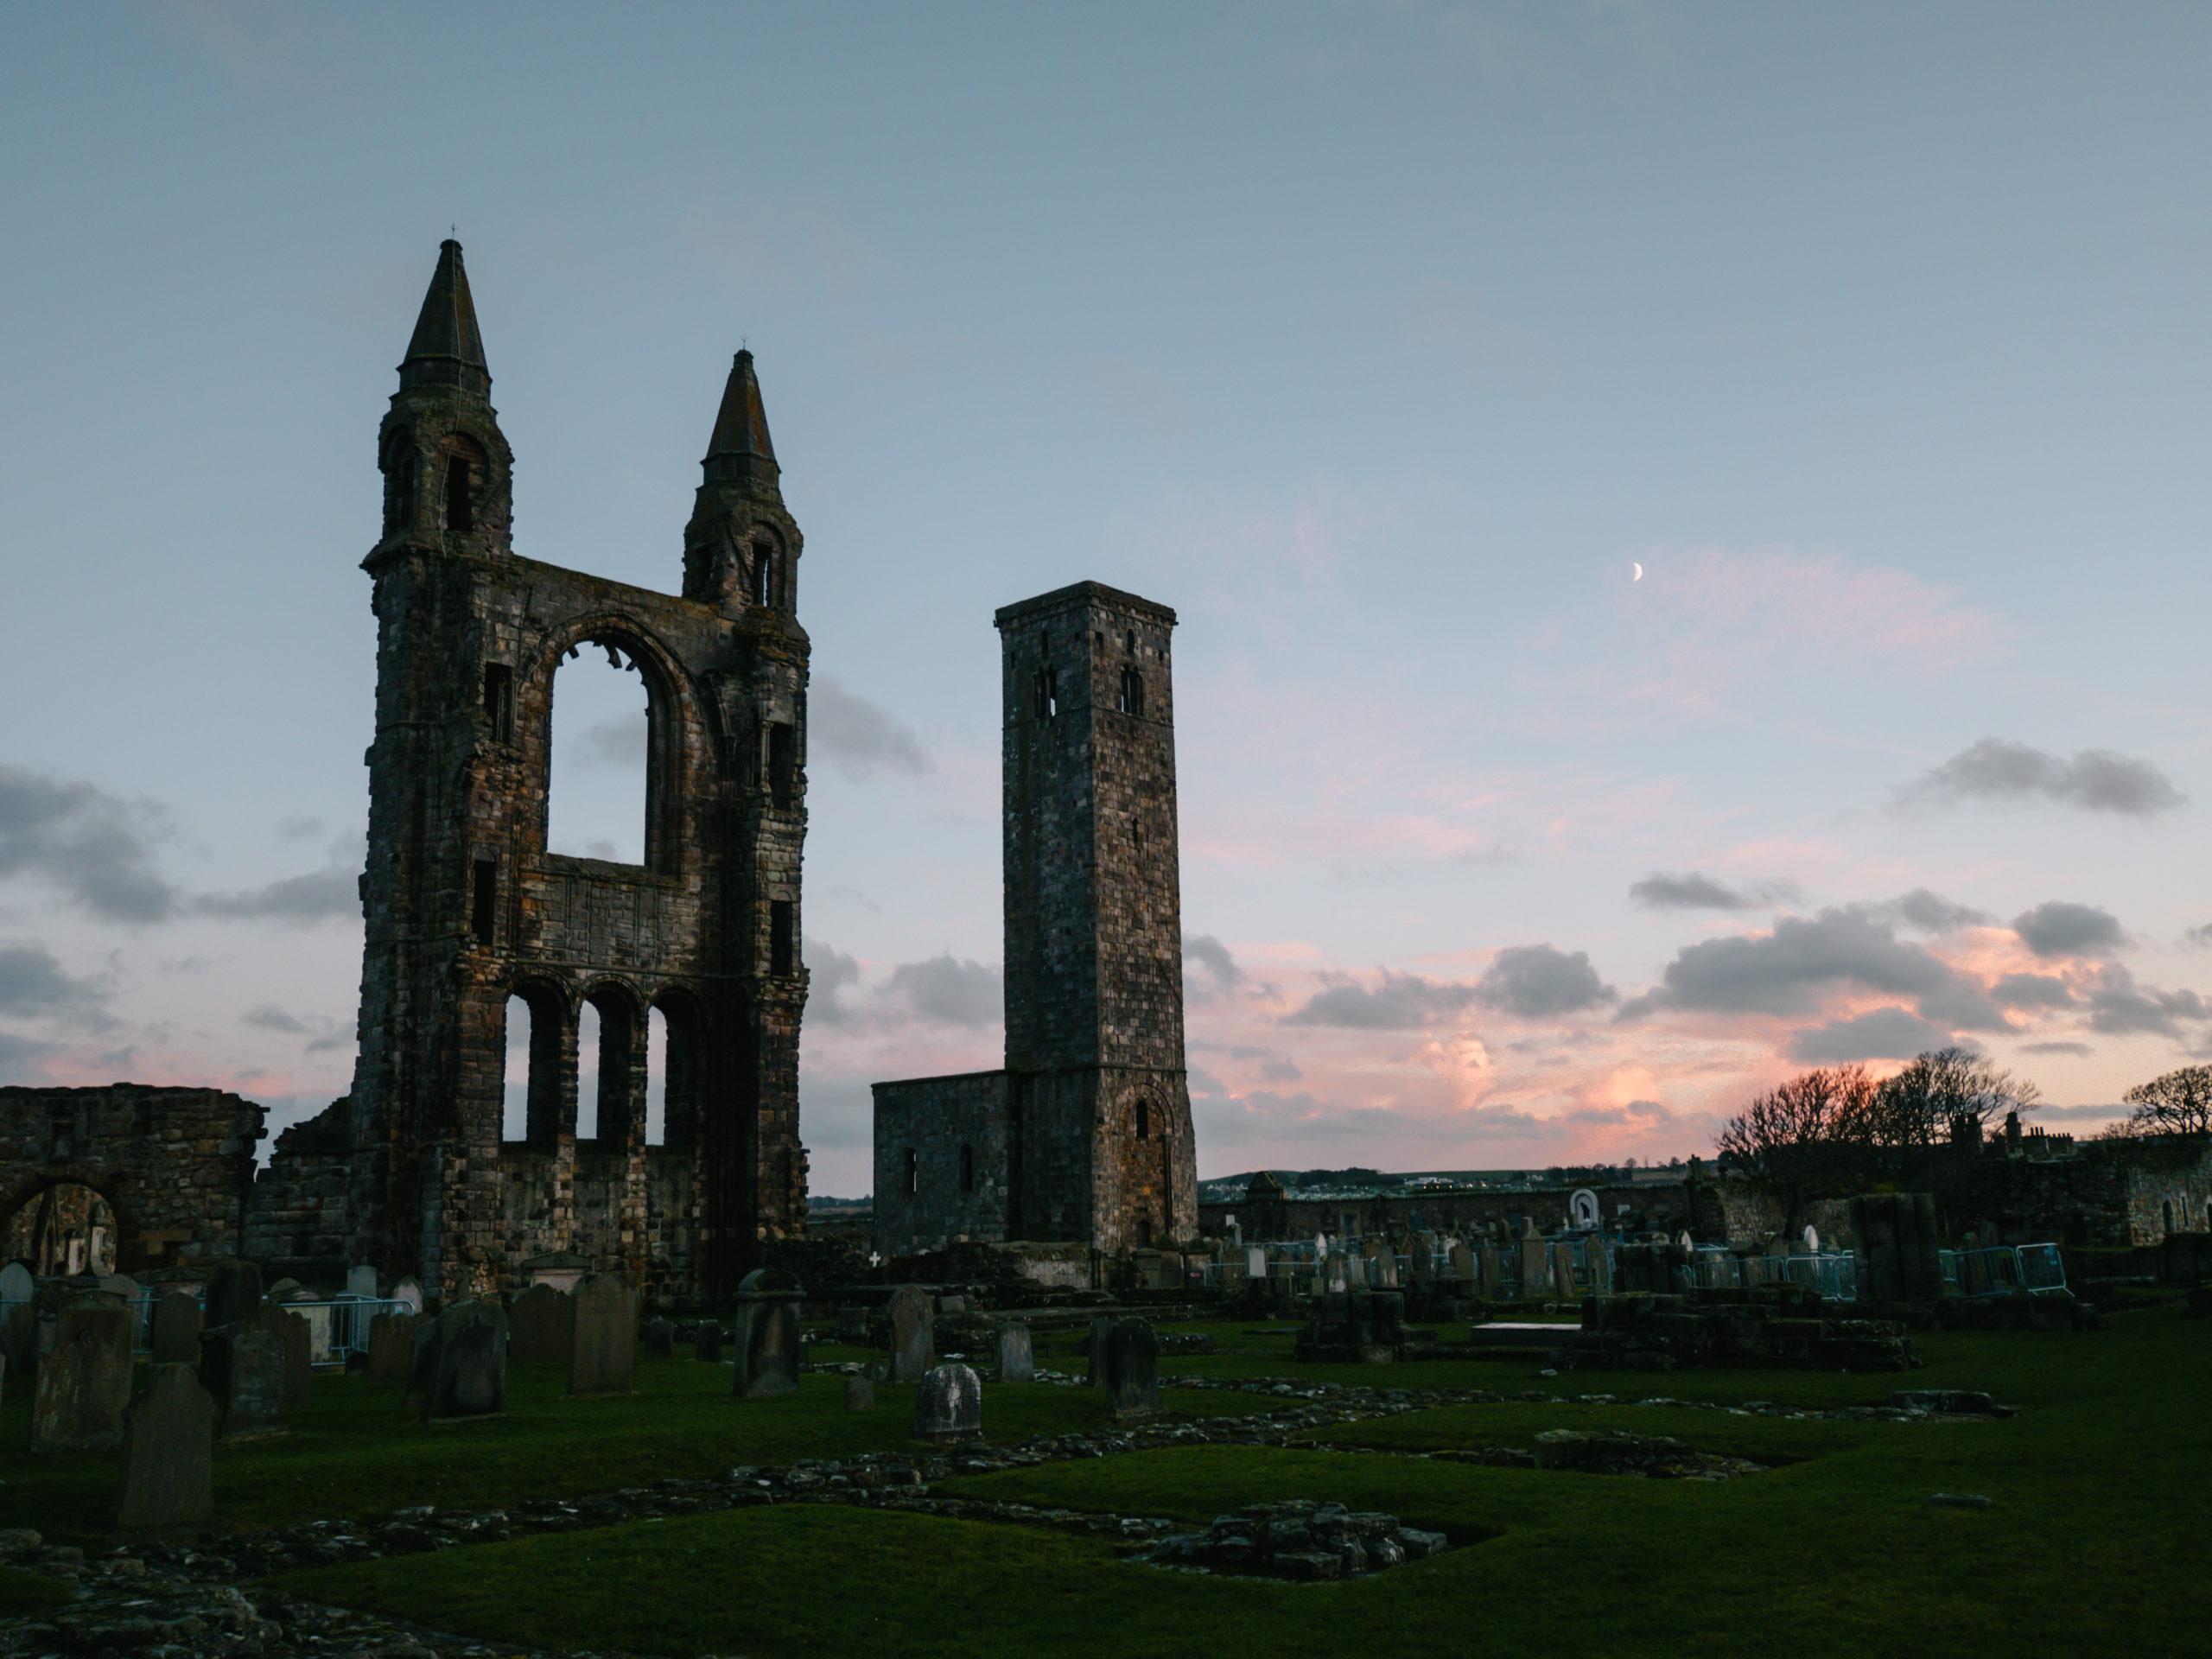 st andrews village scotland écosse catedral sunset